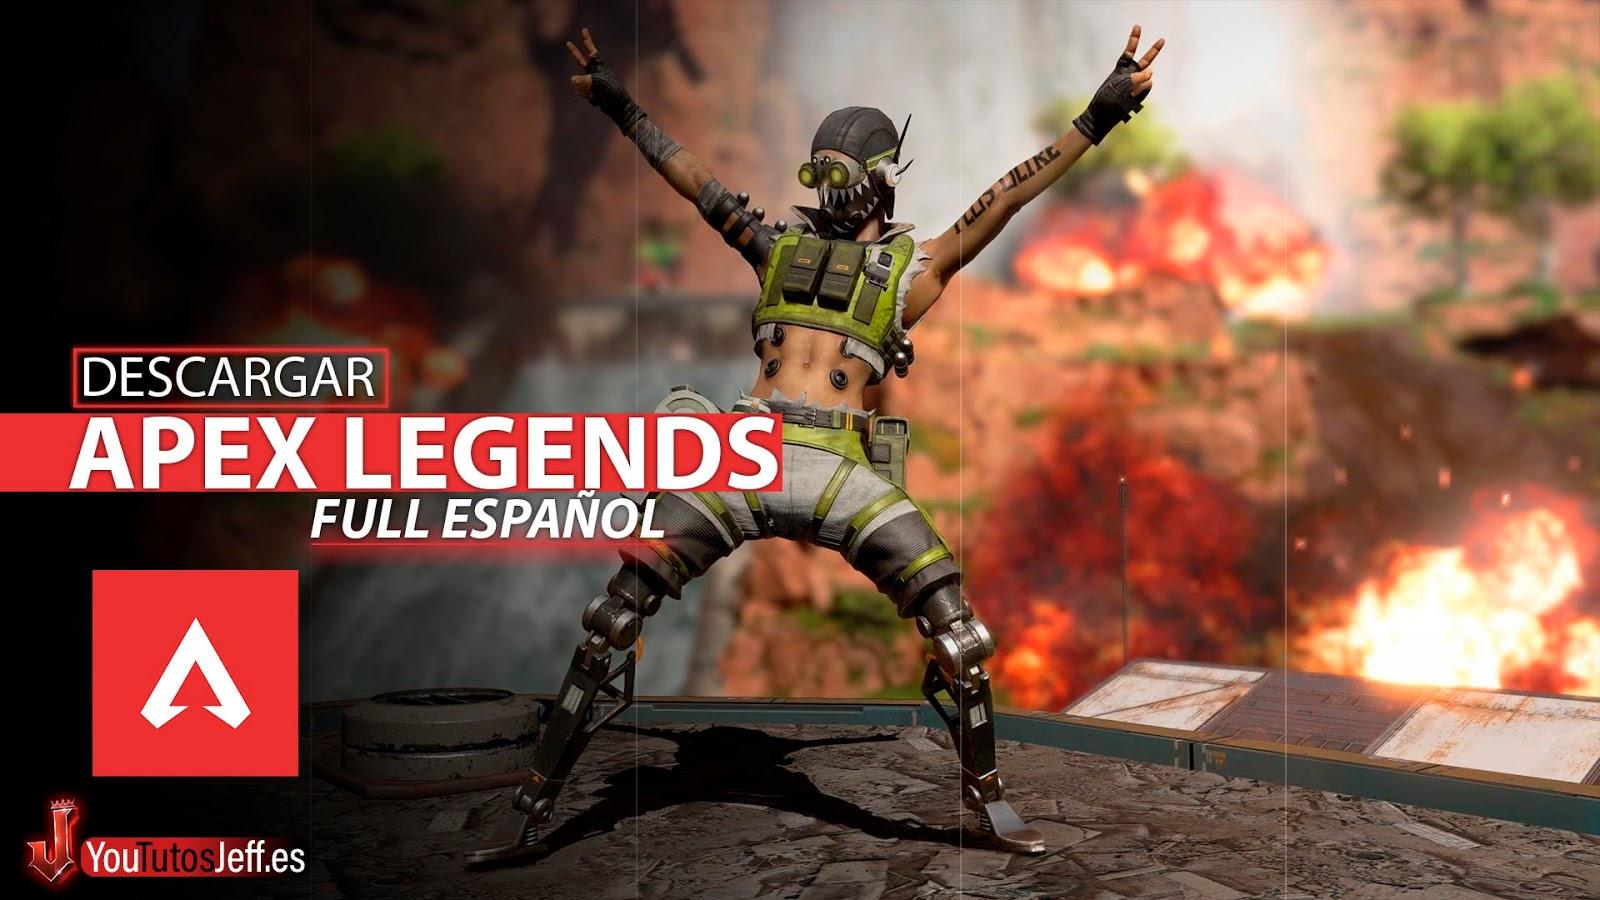 Como Descargar Apex Legends 2020 para PC FULL ESPAÑOL